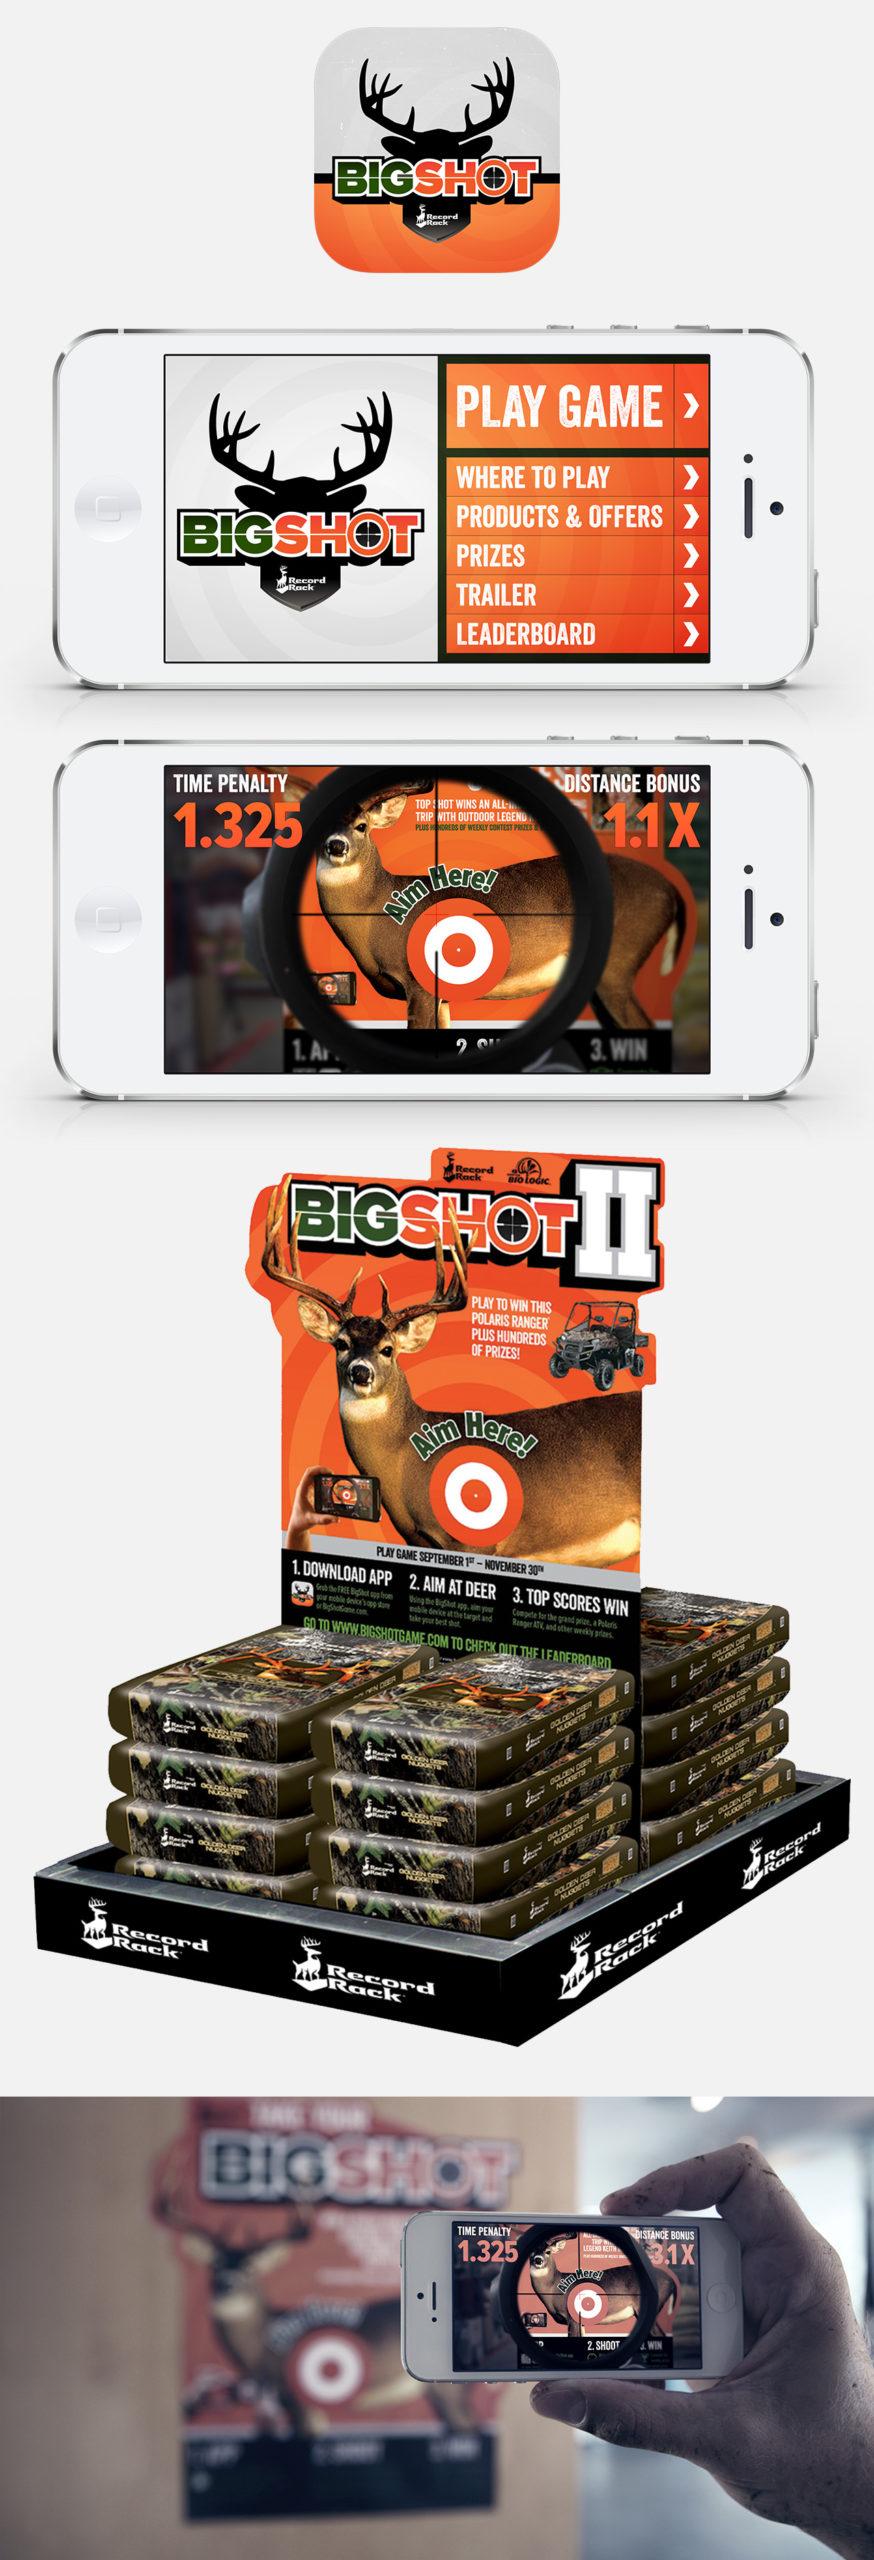 Cargill-BigShot-1